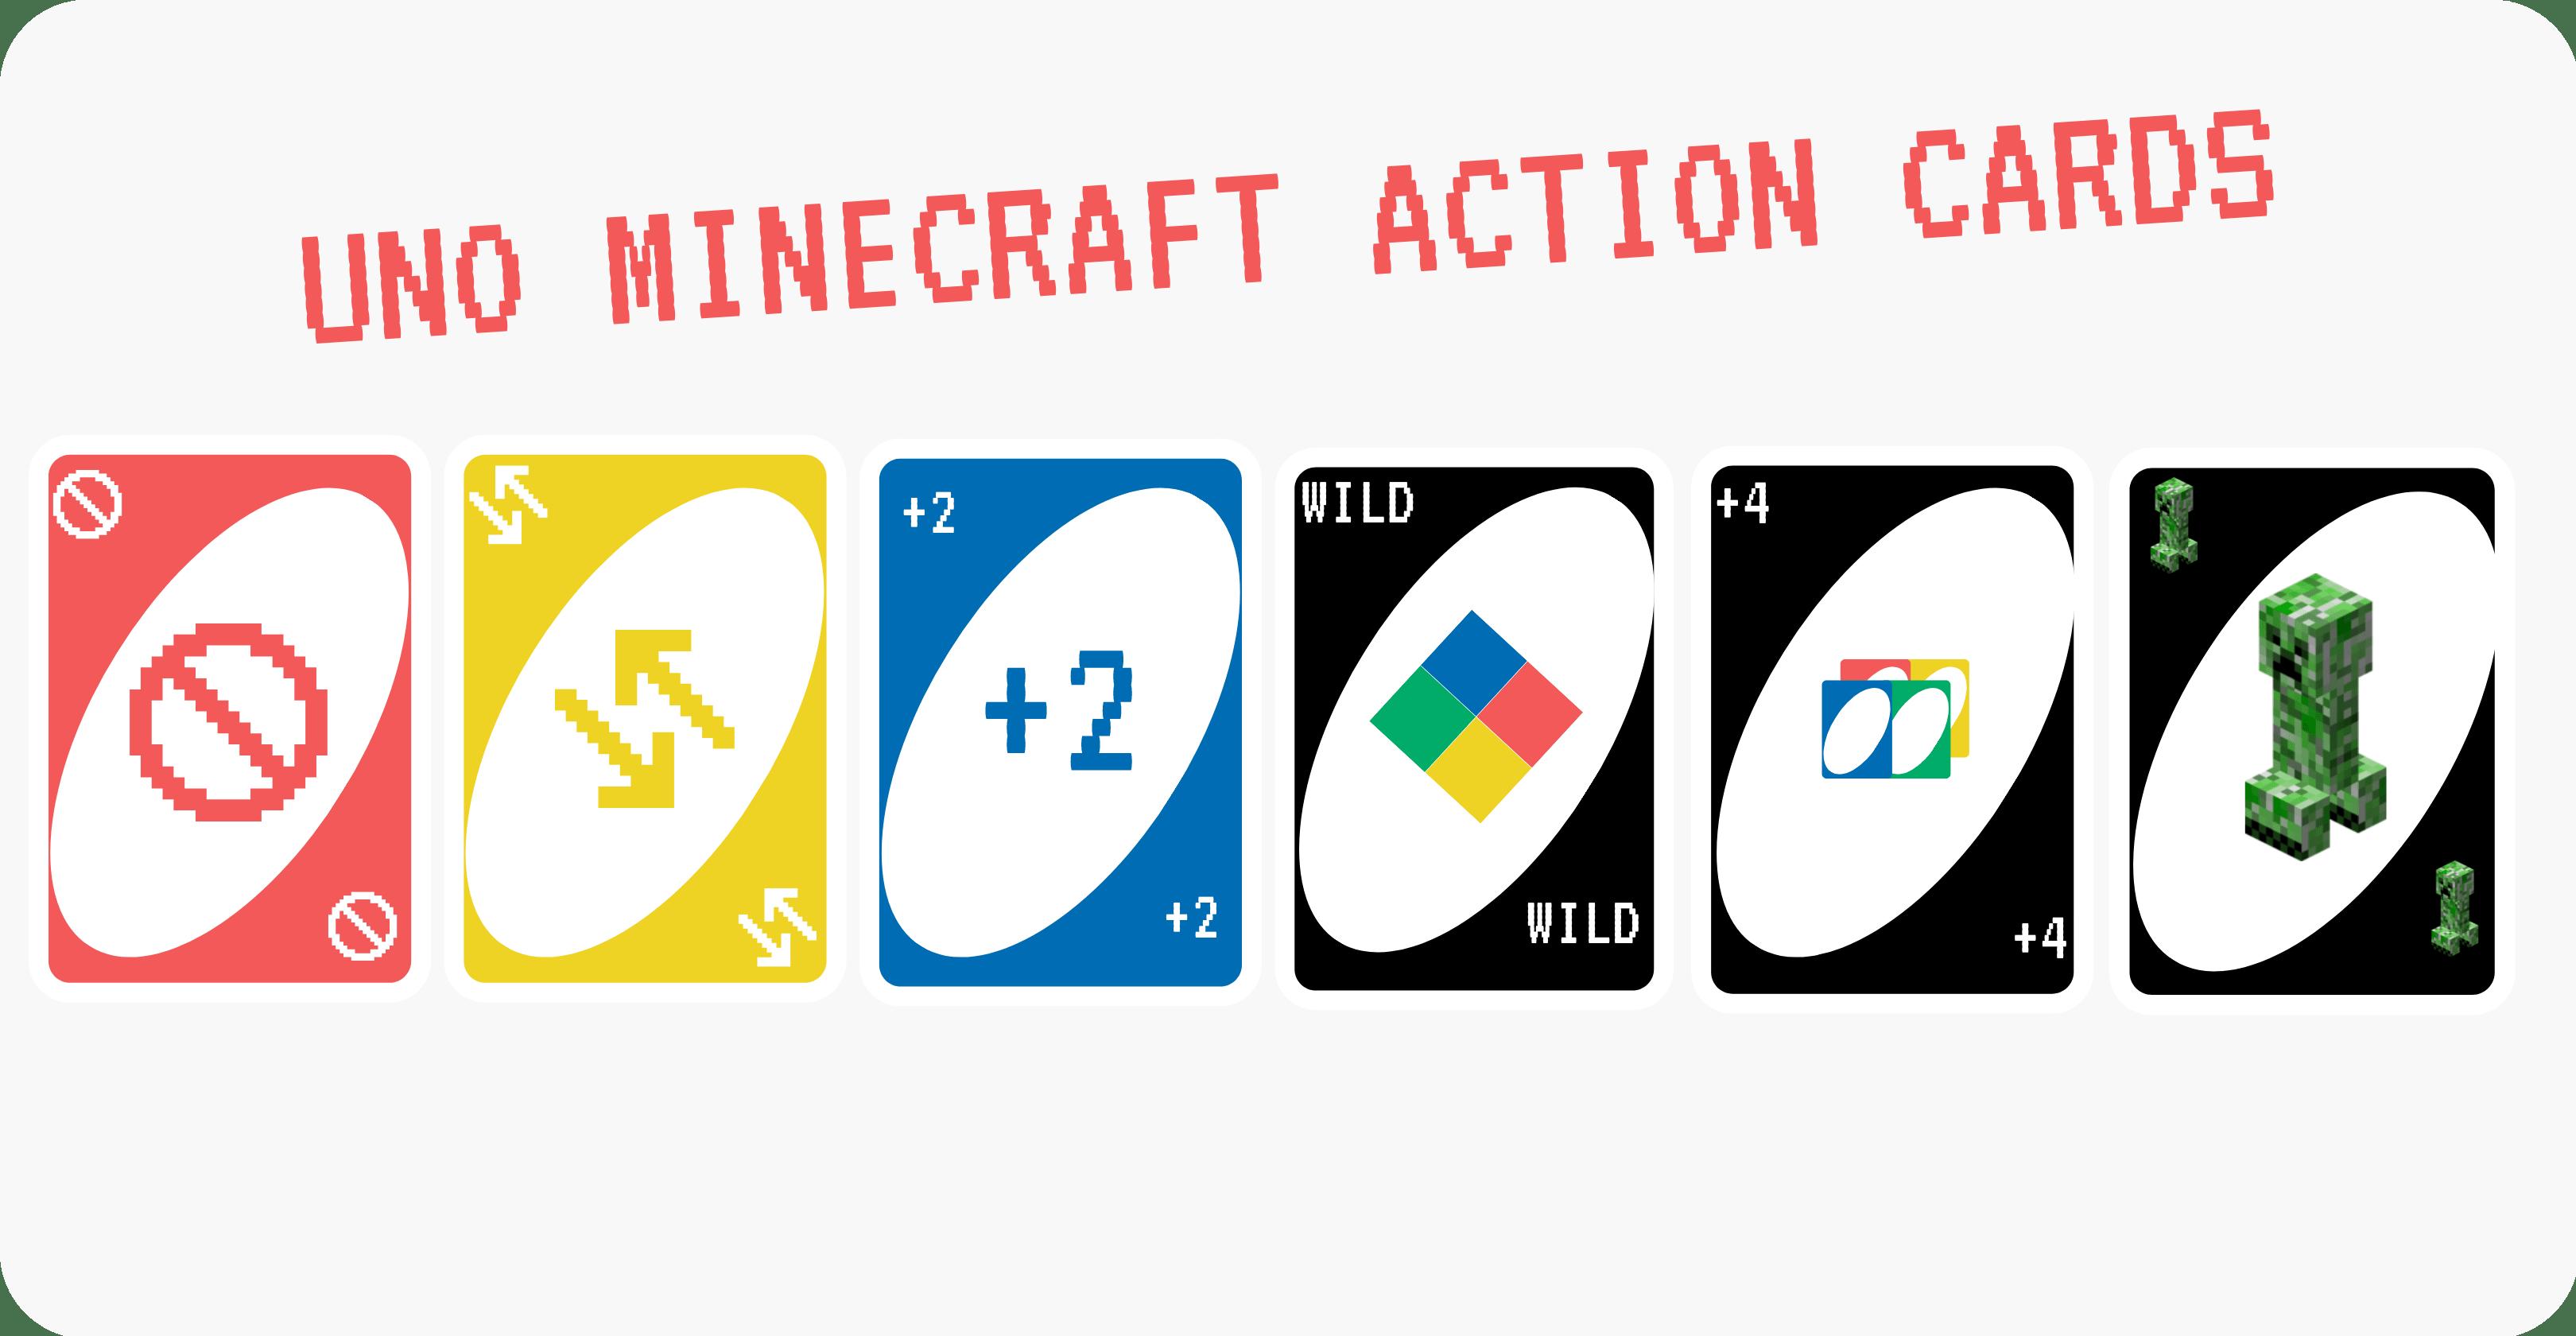 Uno Minecraft Action cards